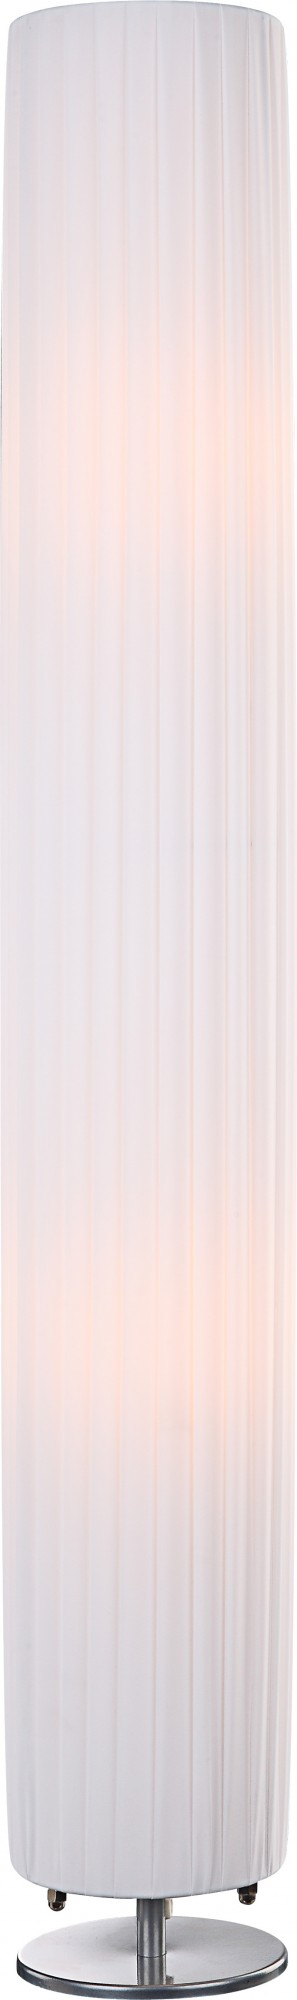 Stehlampe BAILEY, Chrom, Textil weiss, Globo 24662R